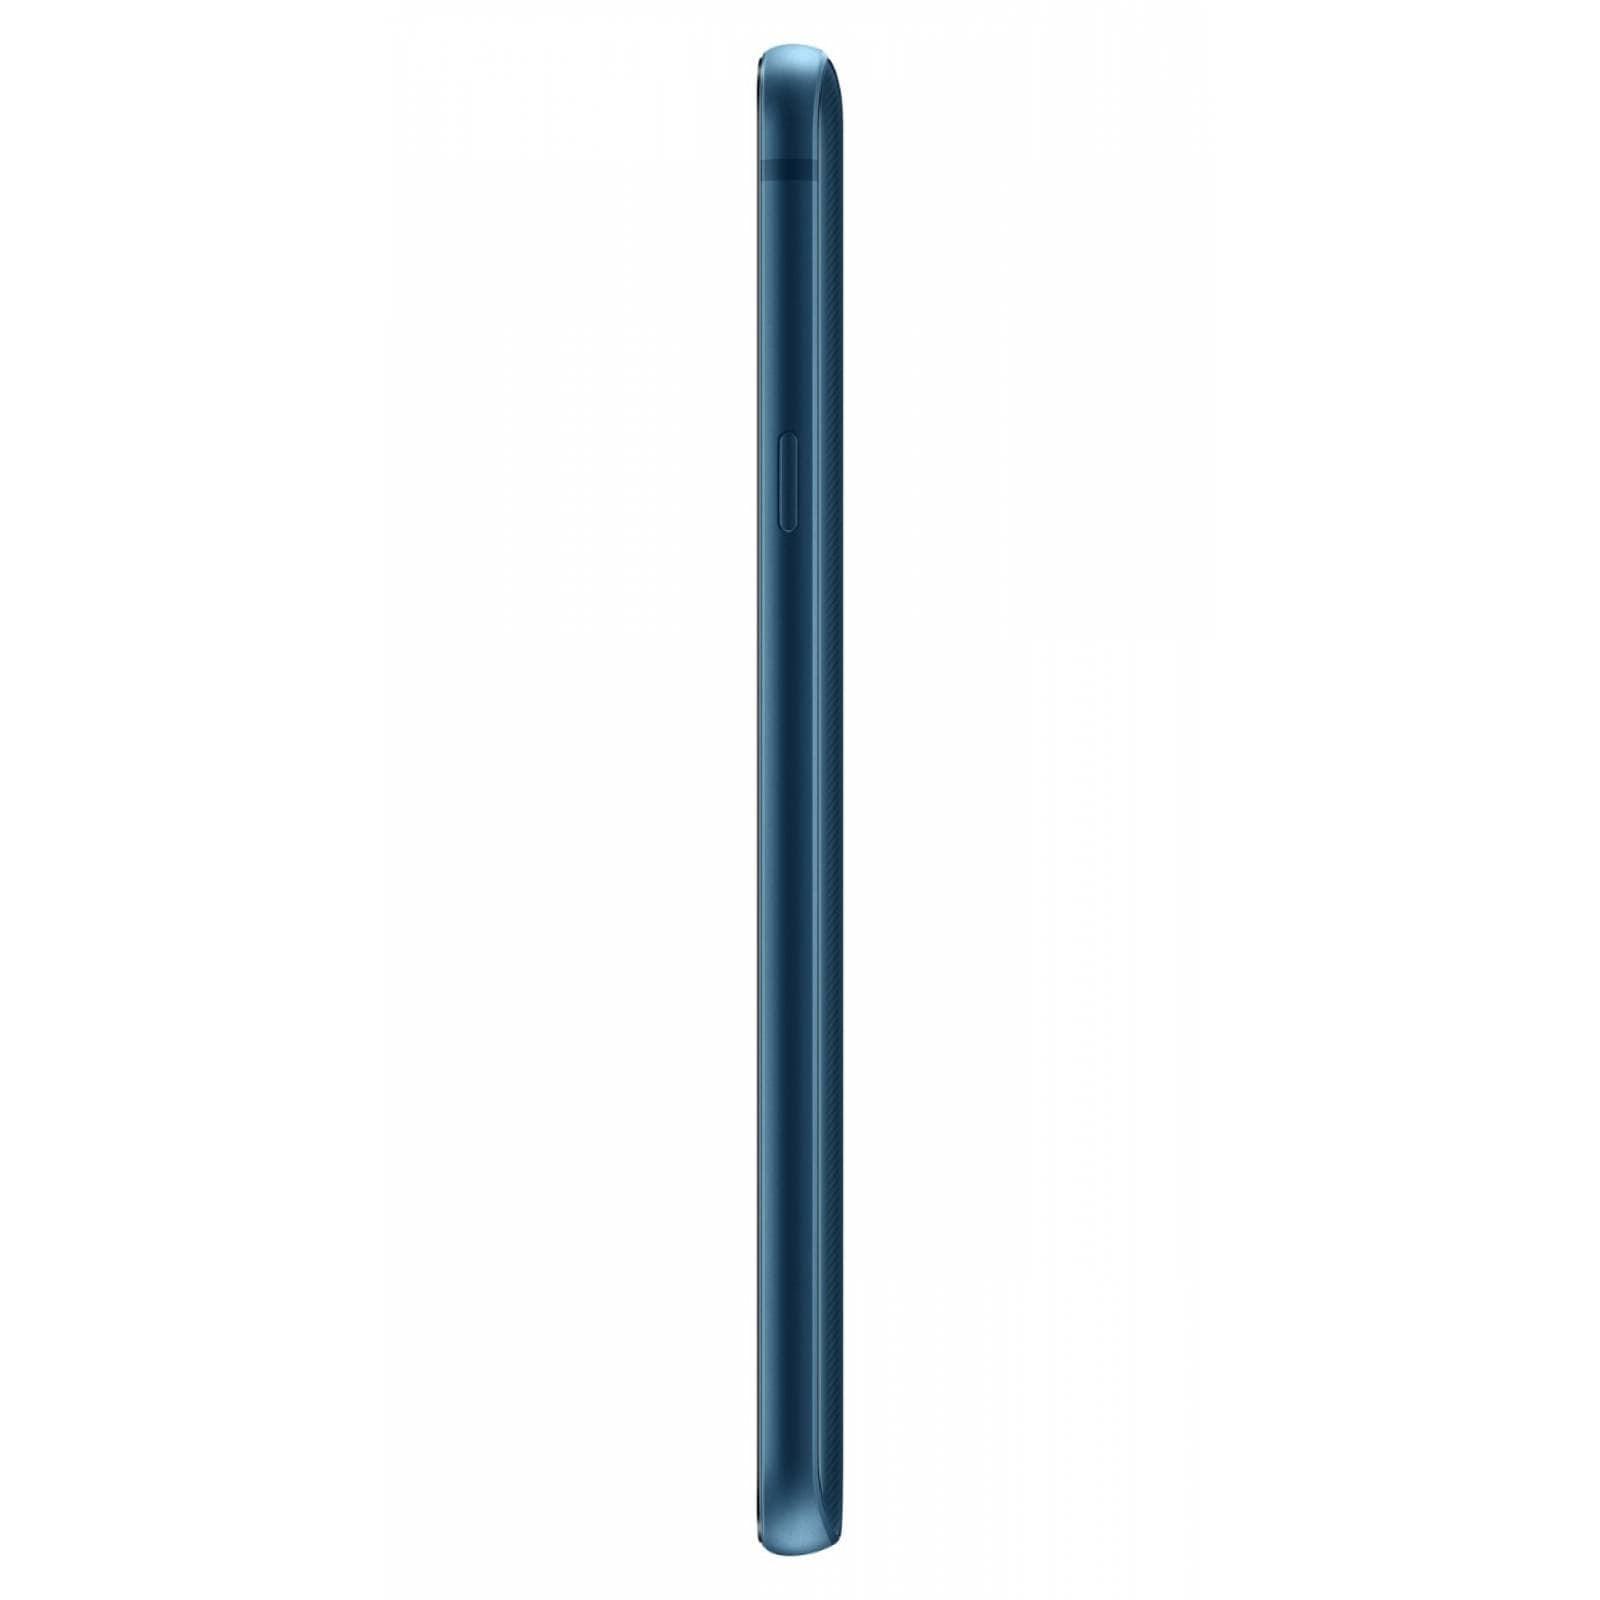 Celular LG LTE LMQ610FS Q7 Color AZUL Telcel